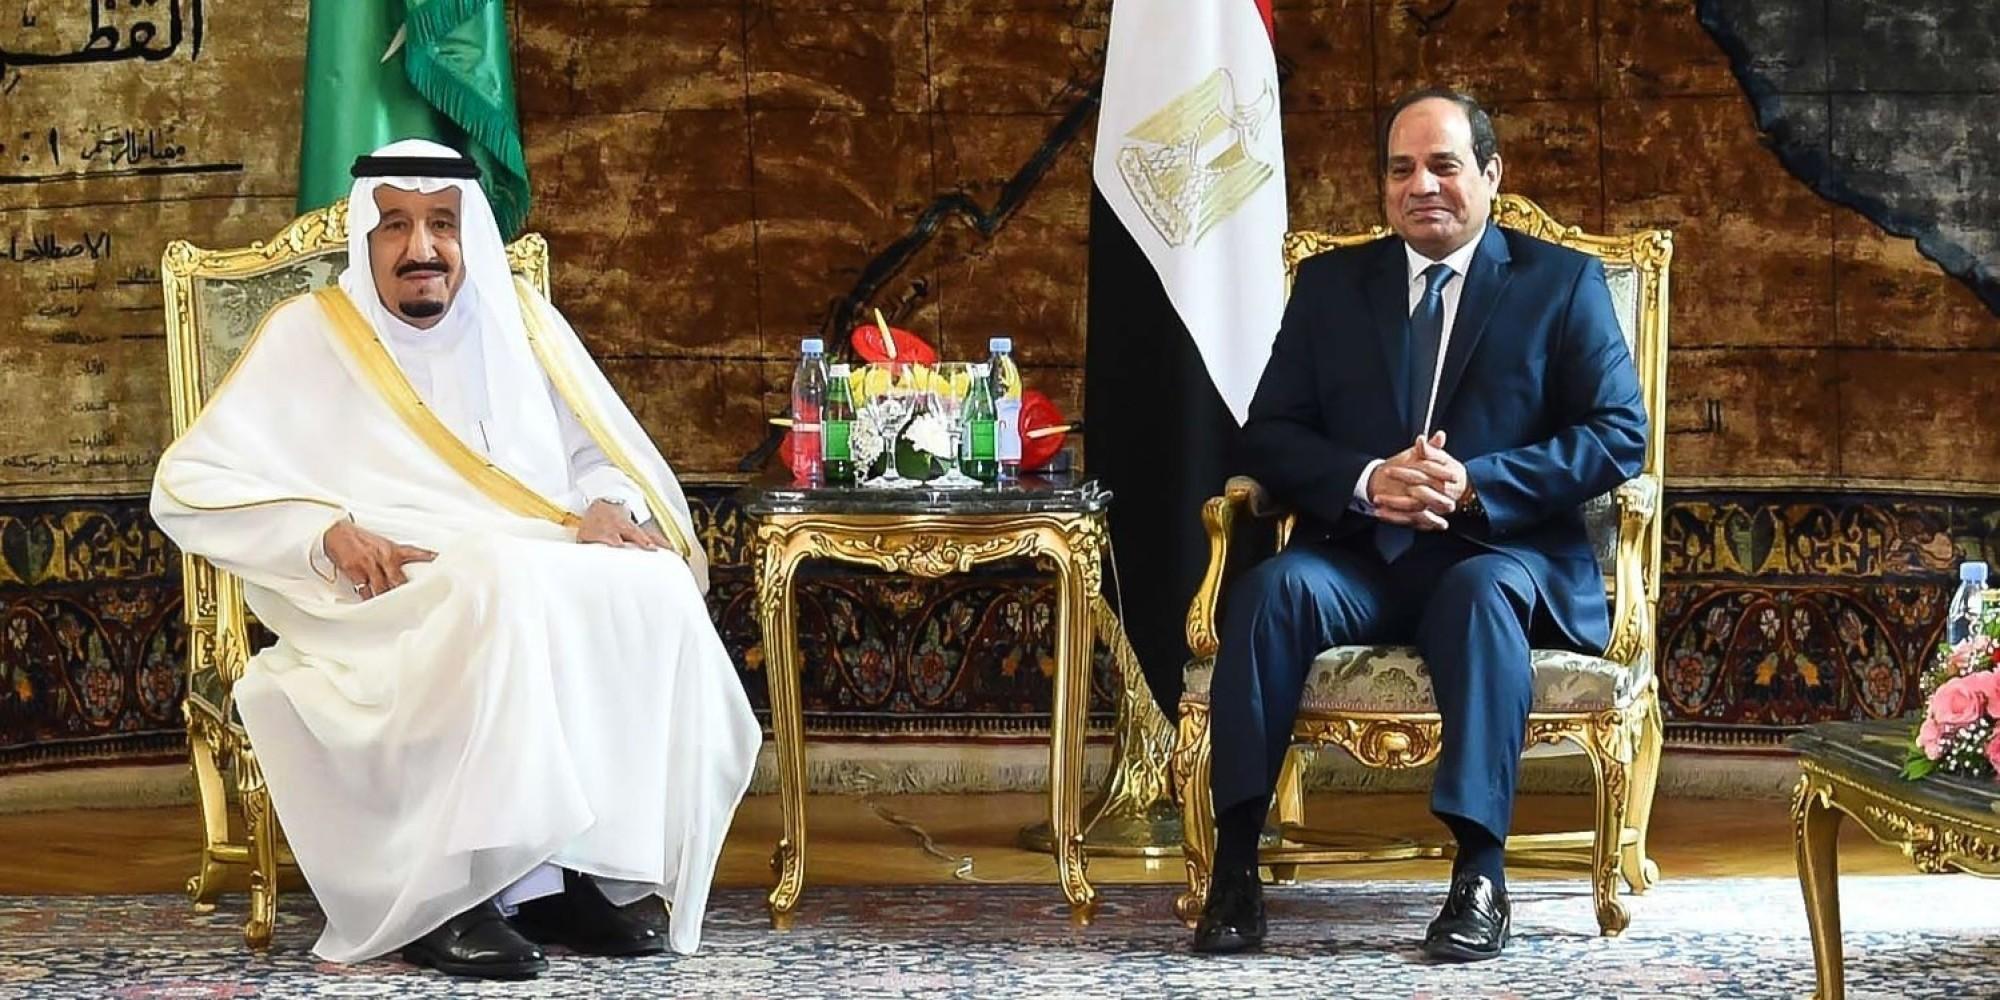 abdel fattah el sisi thesis Abdel-fattah el-sisi / abdel-fattah al-sisi egypt's president abdel fattah al-sisi will not seek a third term in office, he said 7 november 2017.